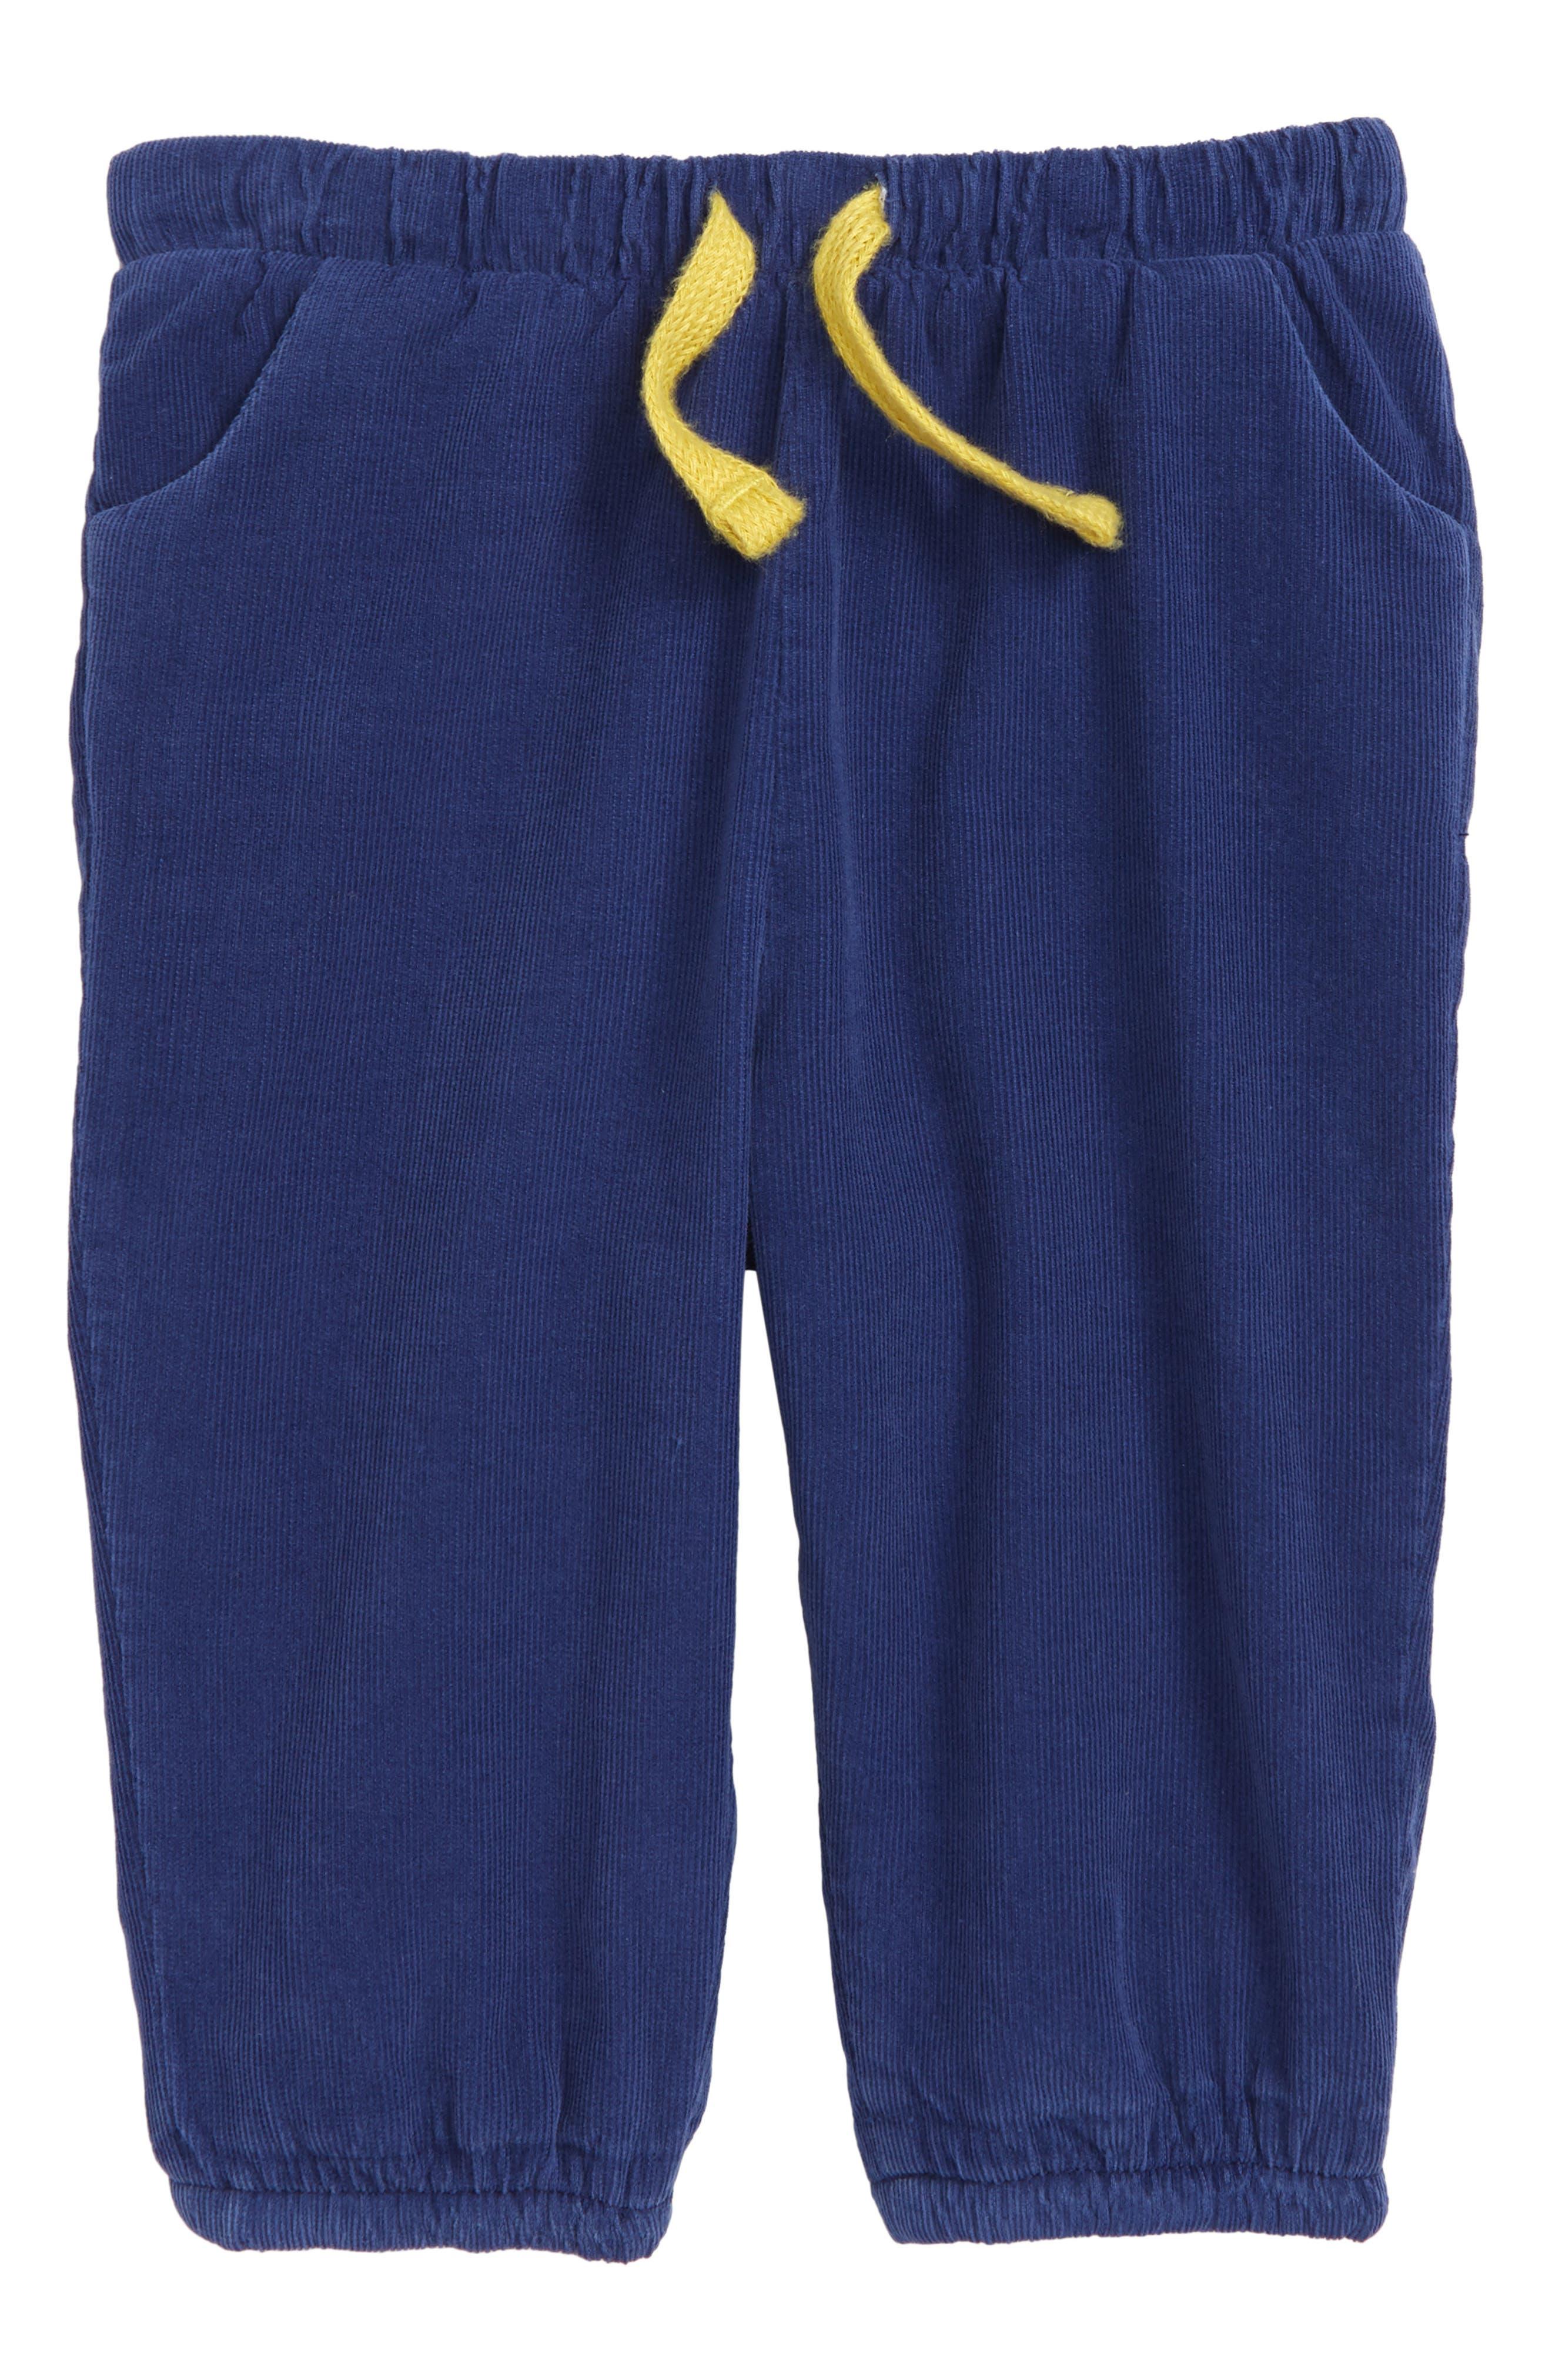 Pocket Pet Corduroy Pants,                             Main thumbnail 1, color,                             404